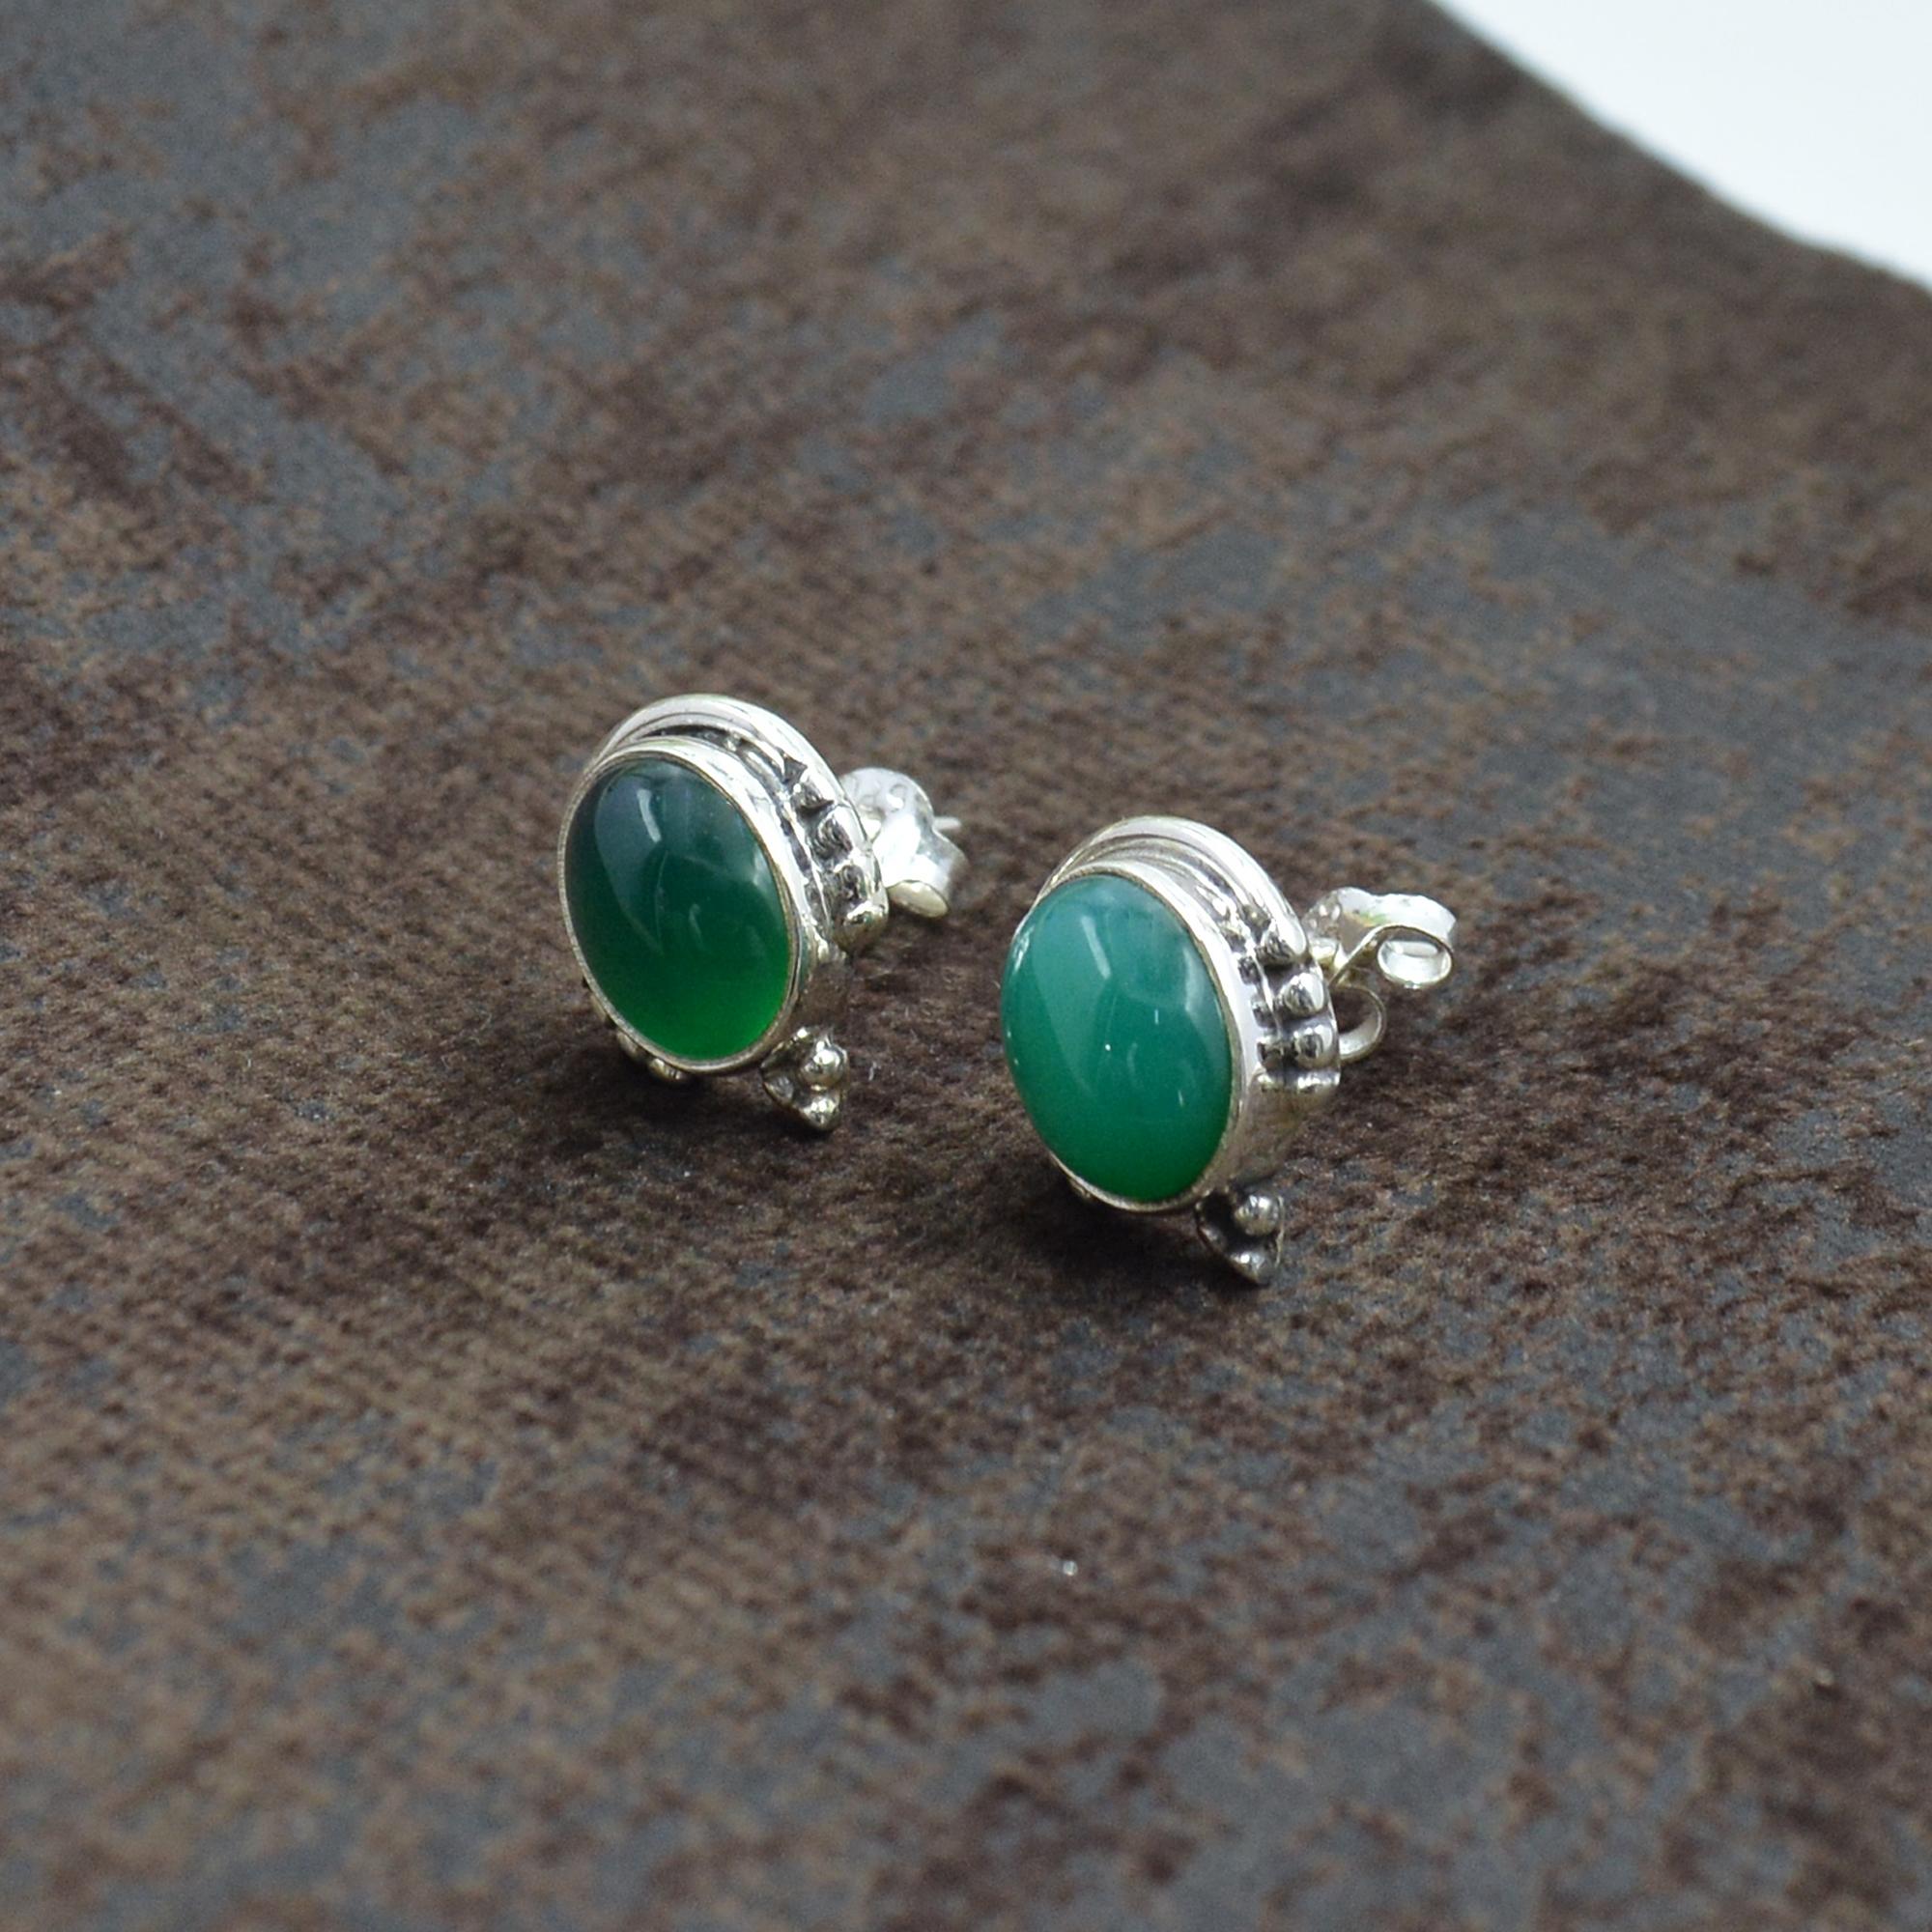 Silvesto India 925 Sterling Silver Natural Light Green Onyx Oval Shape Gemstone Stud Earring For Women